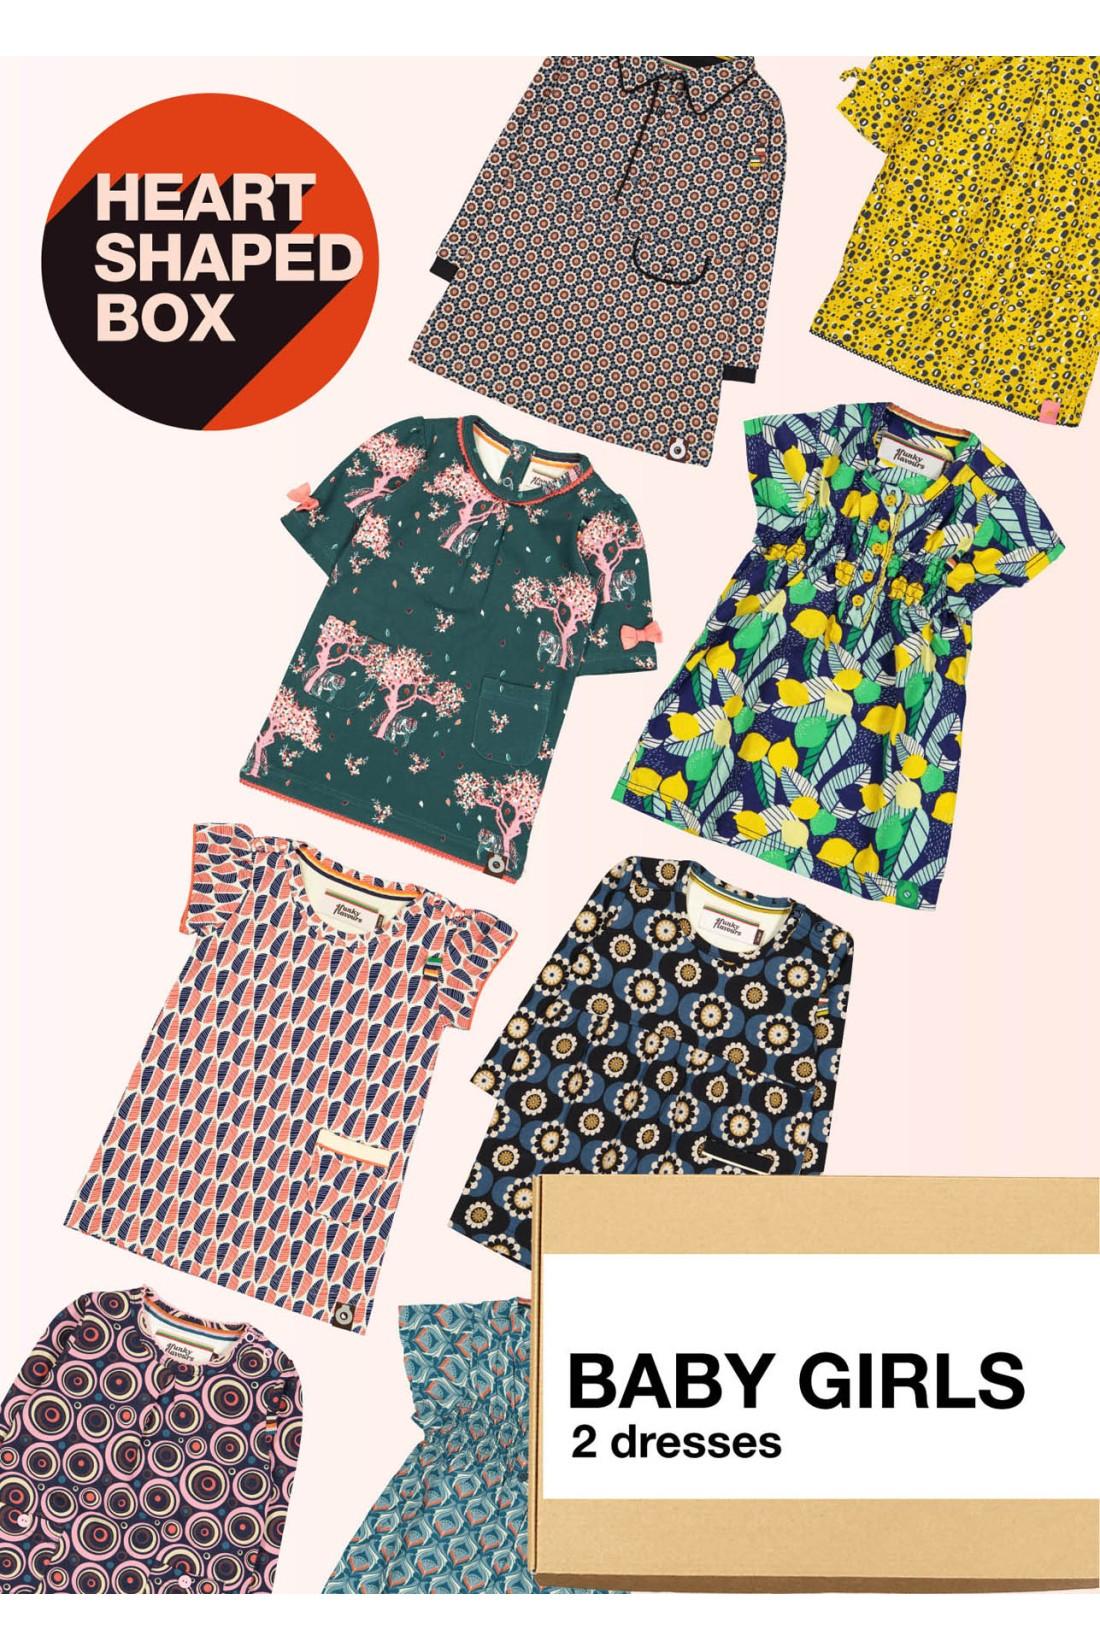 Surprise Box Baby Girl - HEART SHAPED BOX - 2x Baby Dress